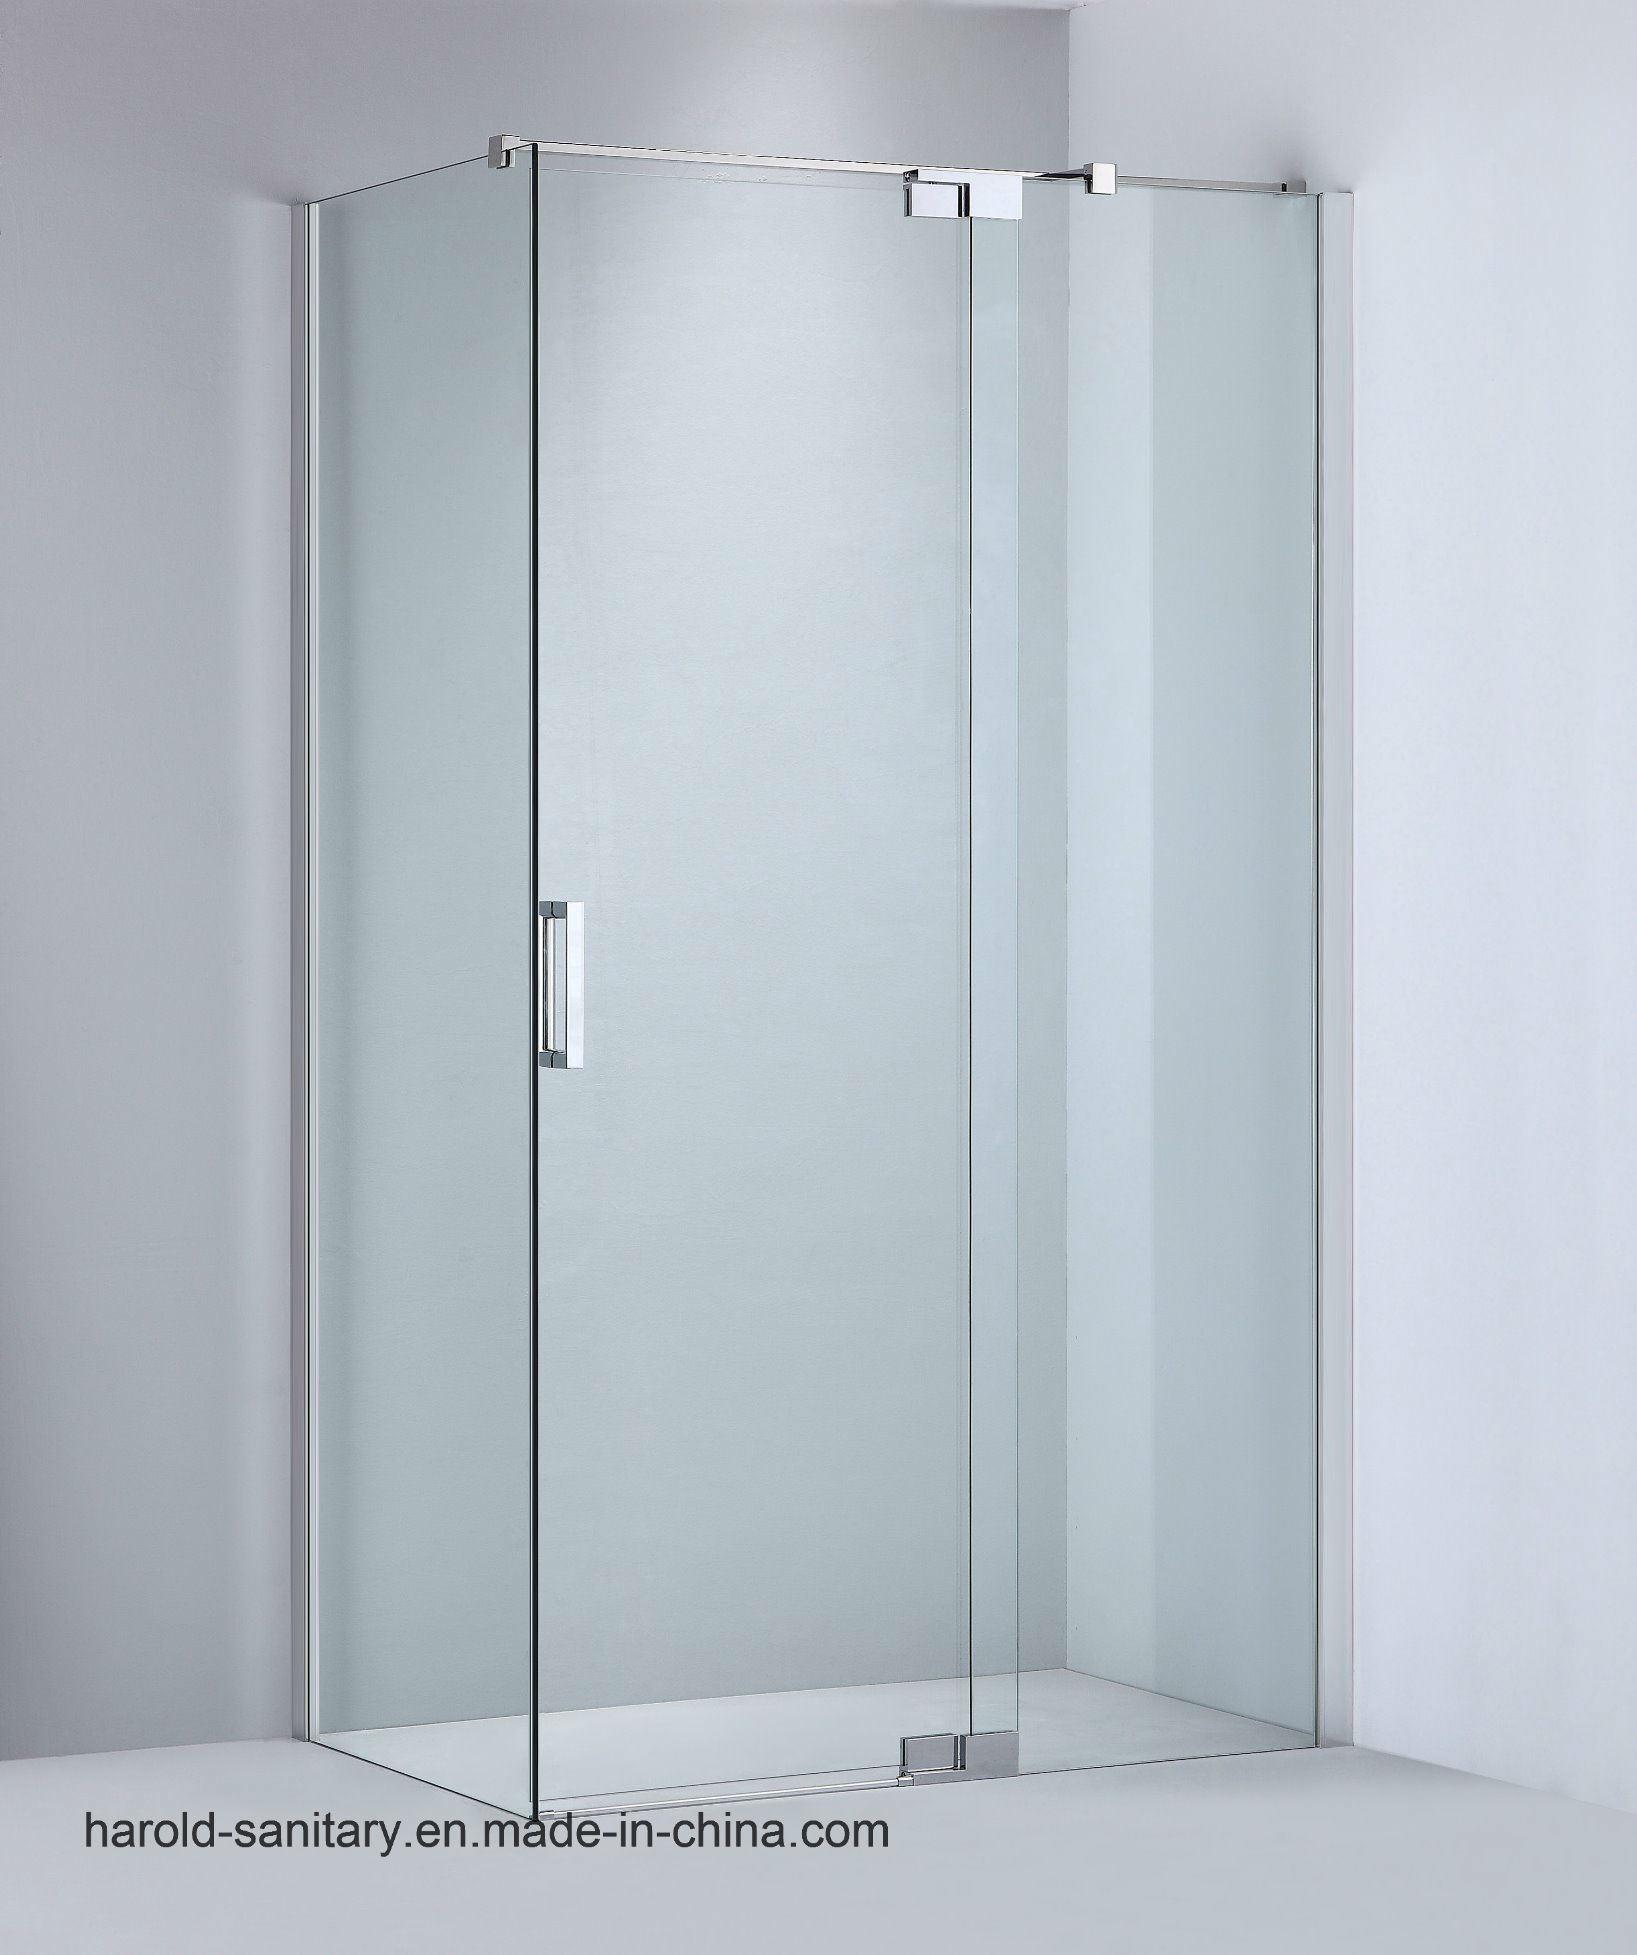 Hot Item Pivot Hinge Open Glass Shower Screen